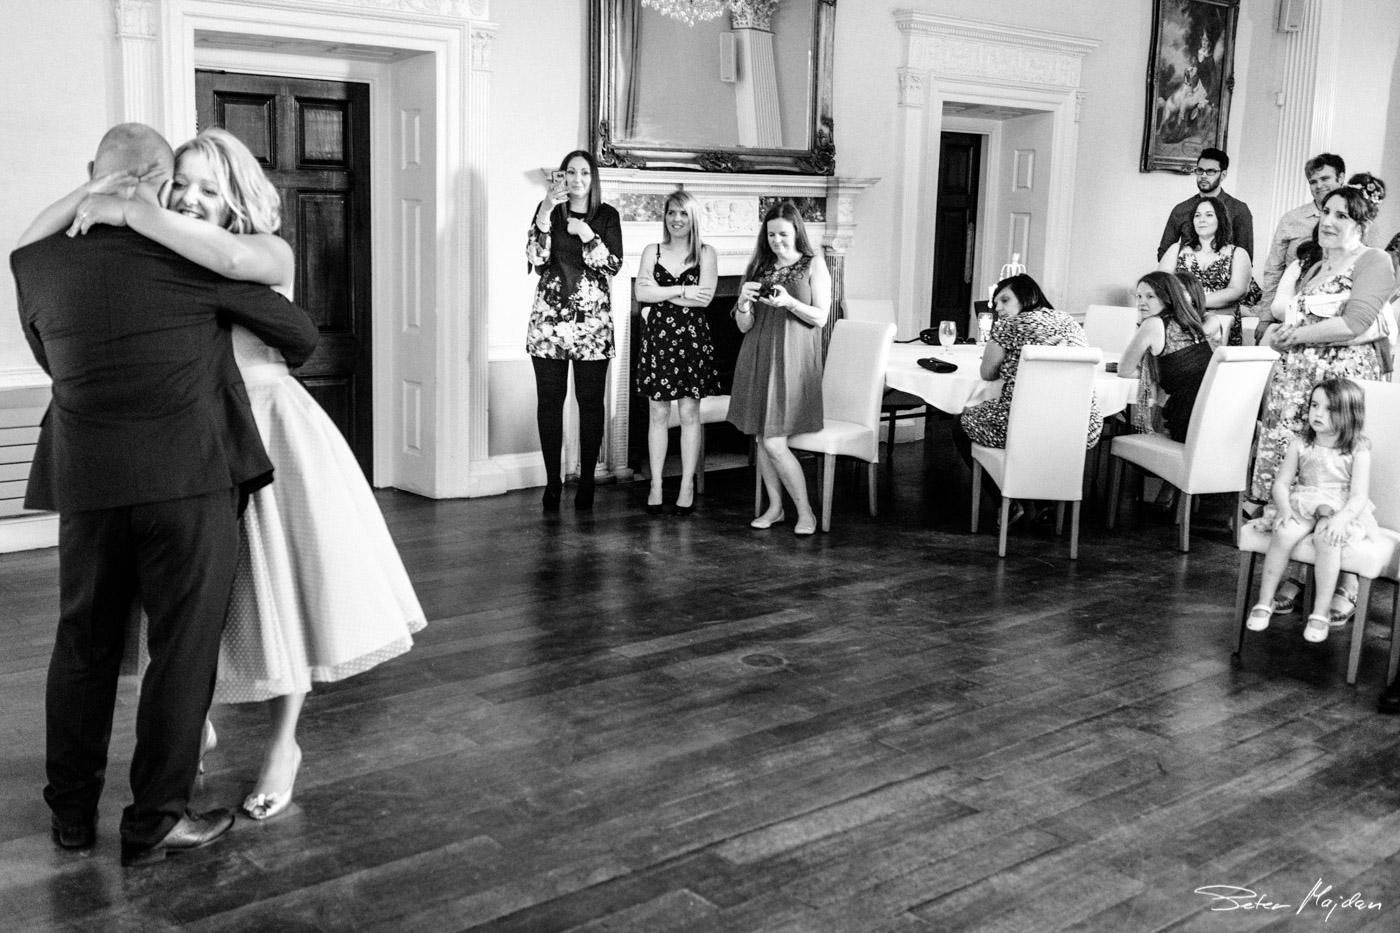 Colwick-hall-wedding-photography-66.jpg